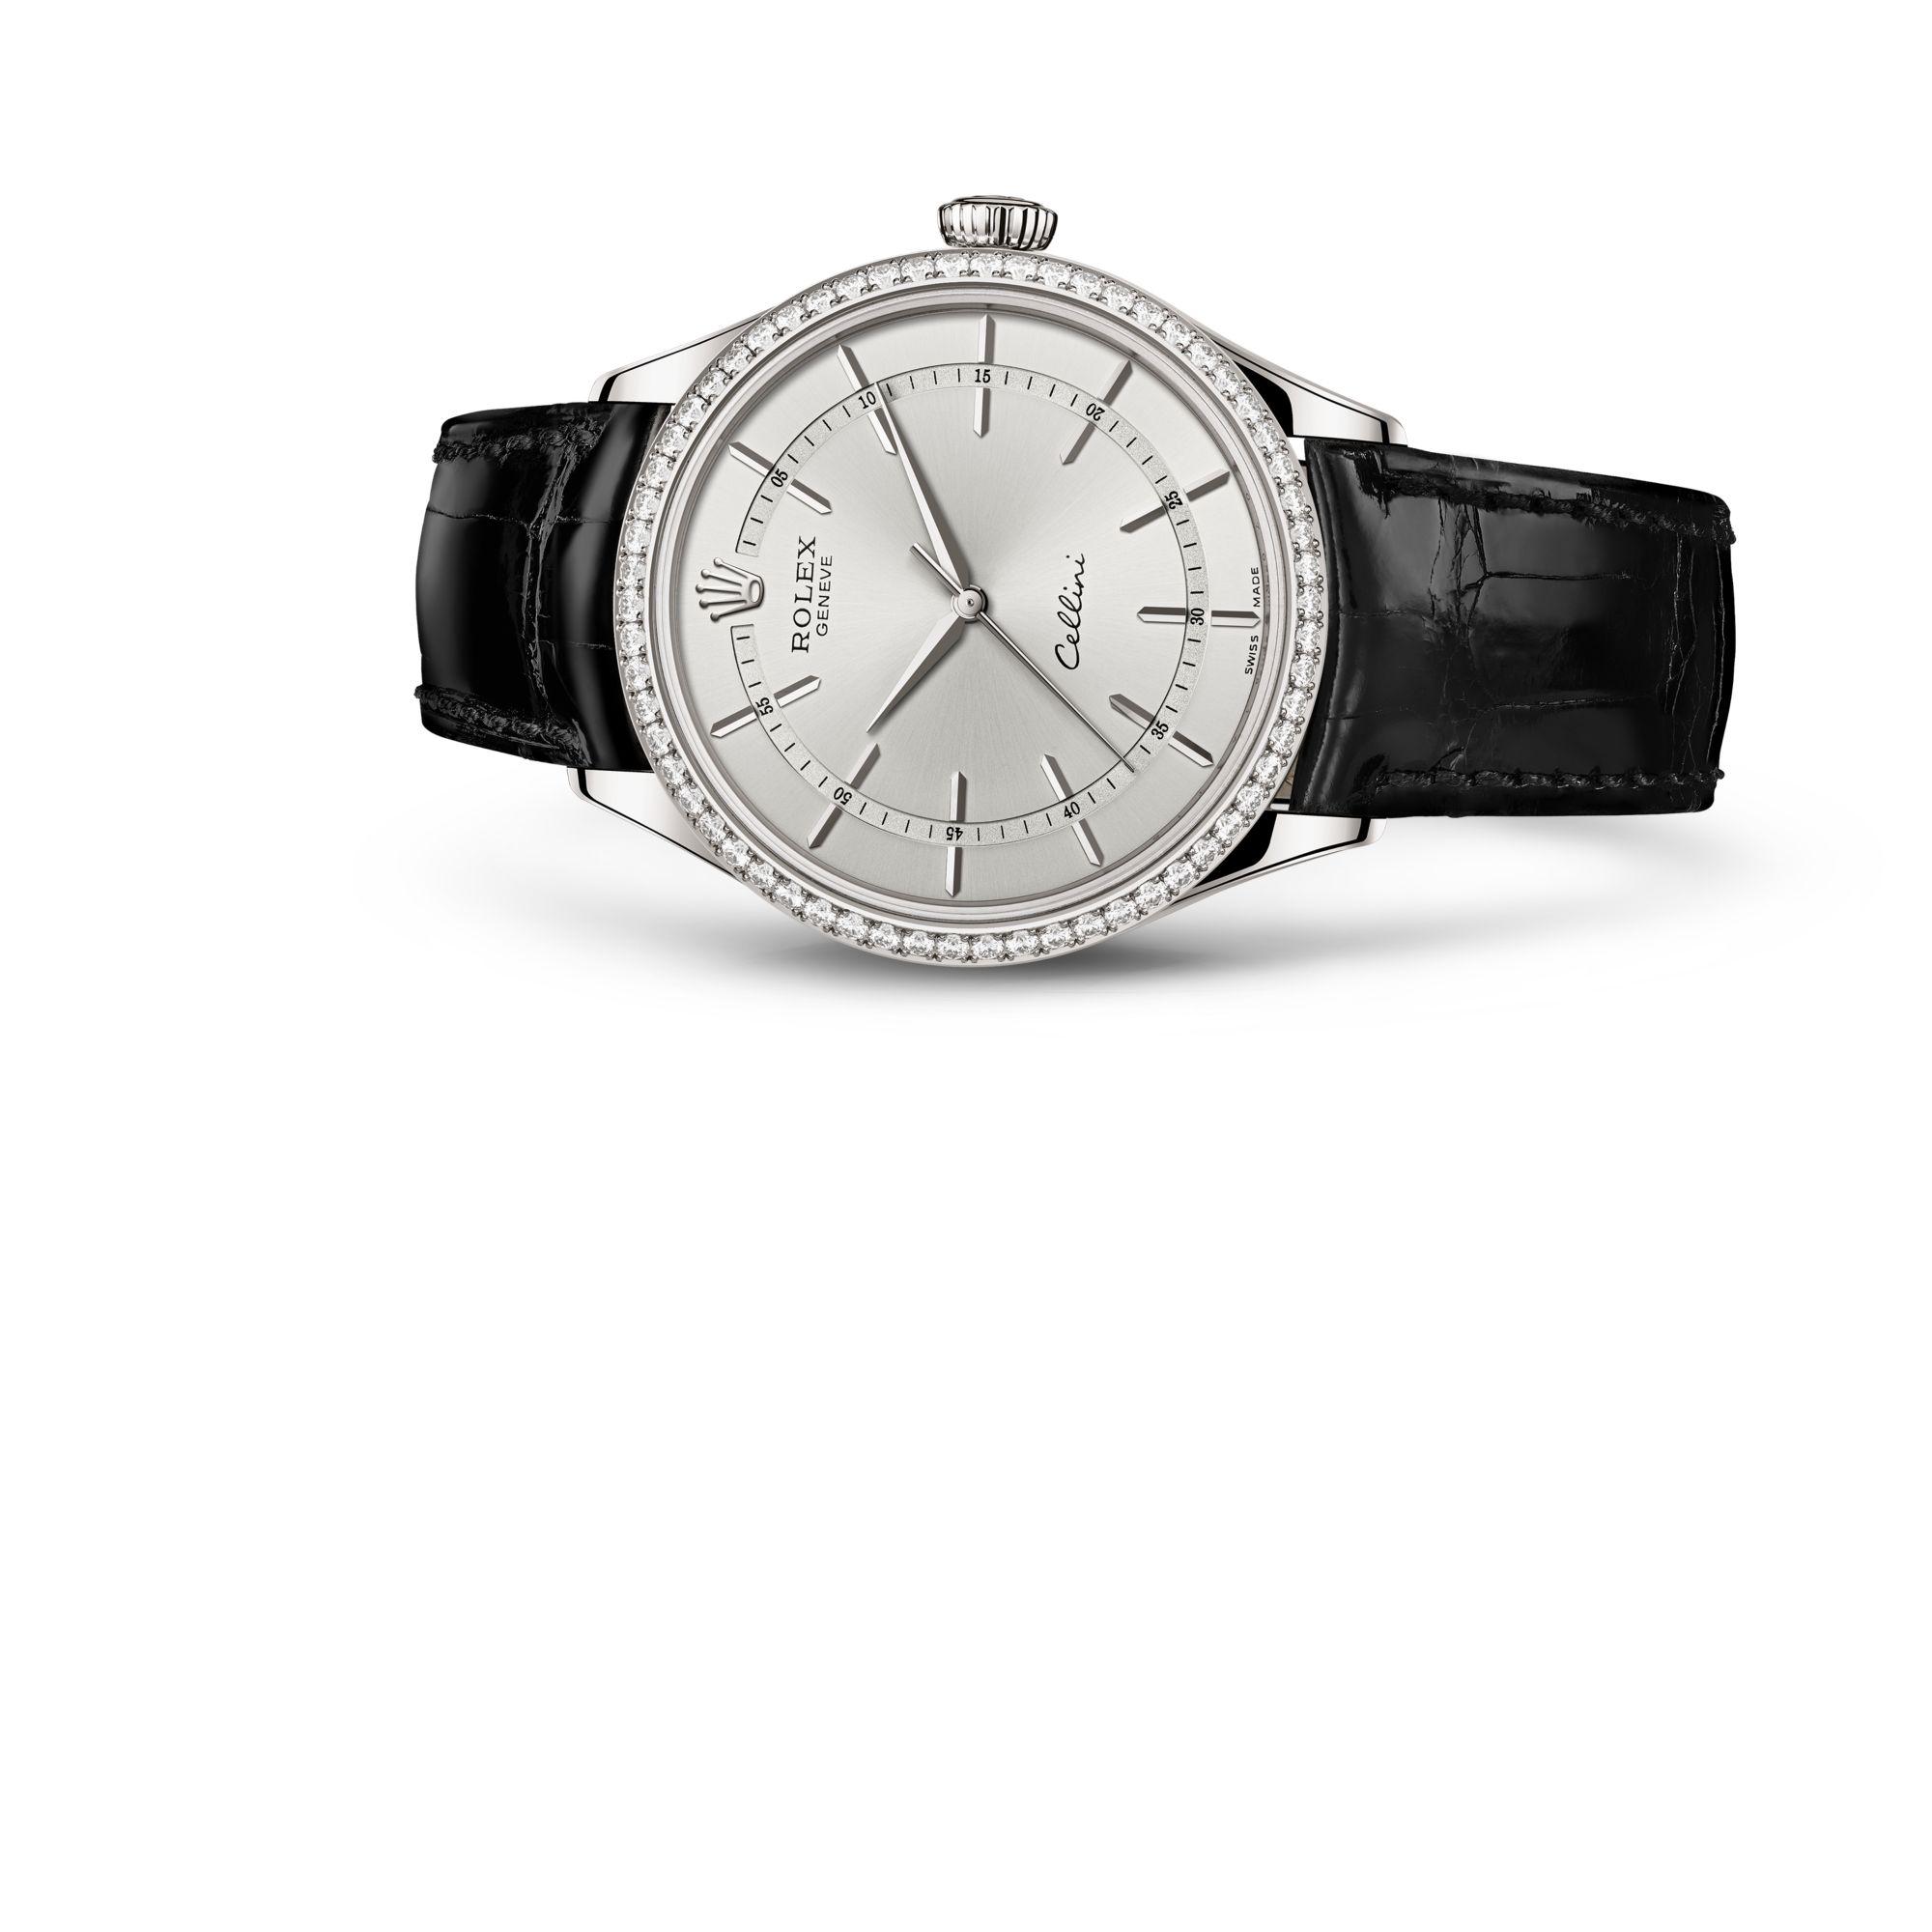 Rolex Cellini Time M50709RBR-0010